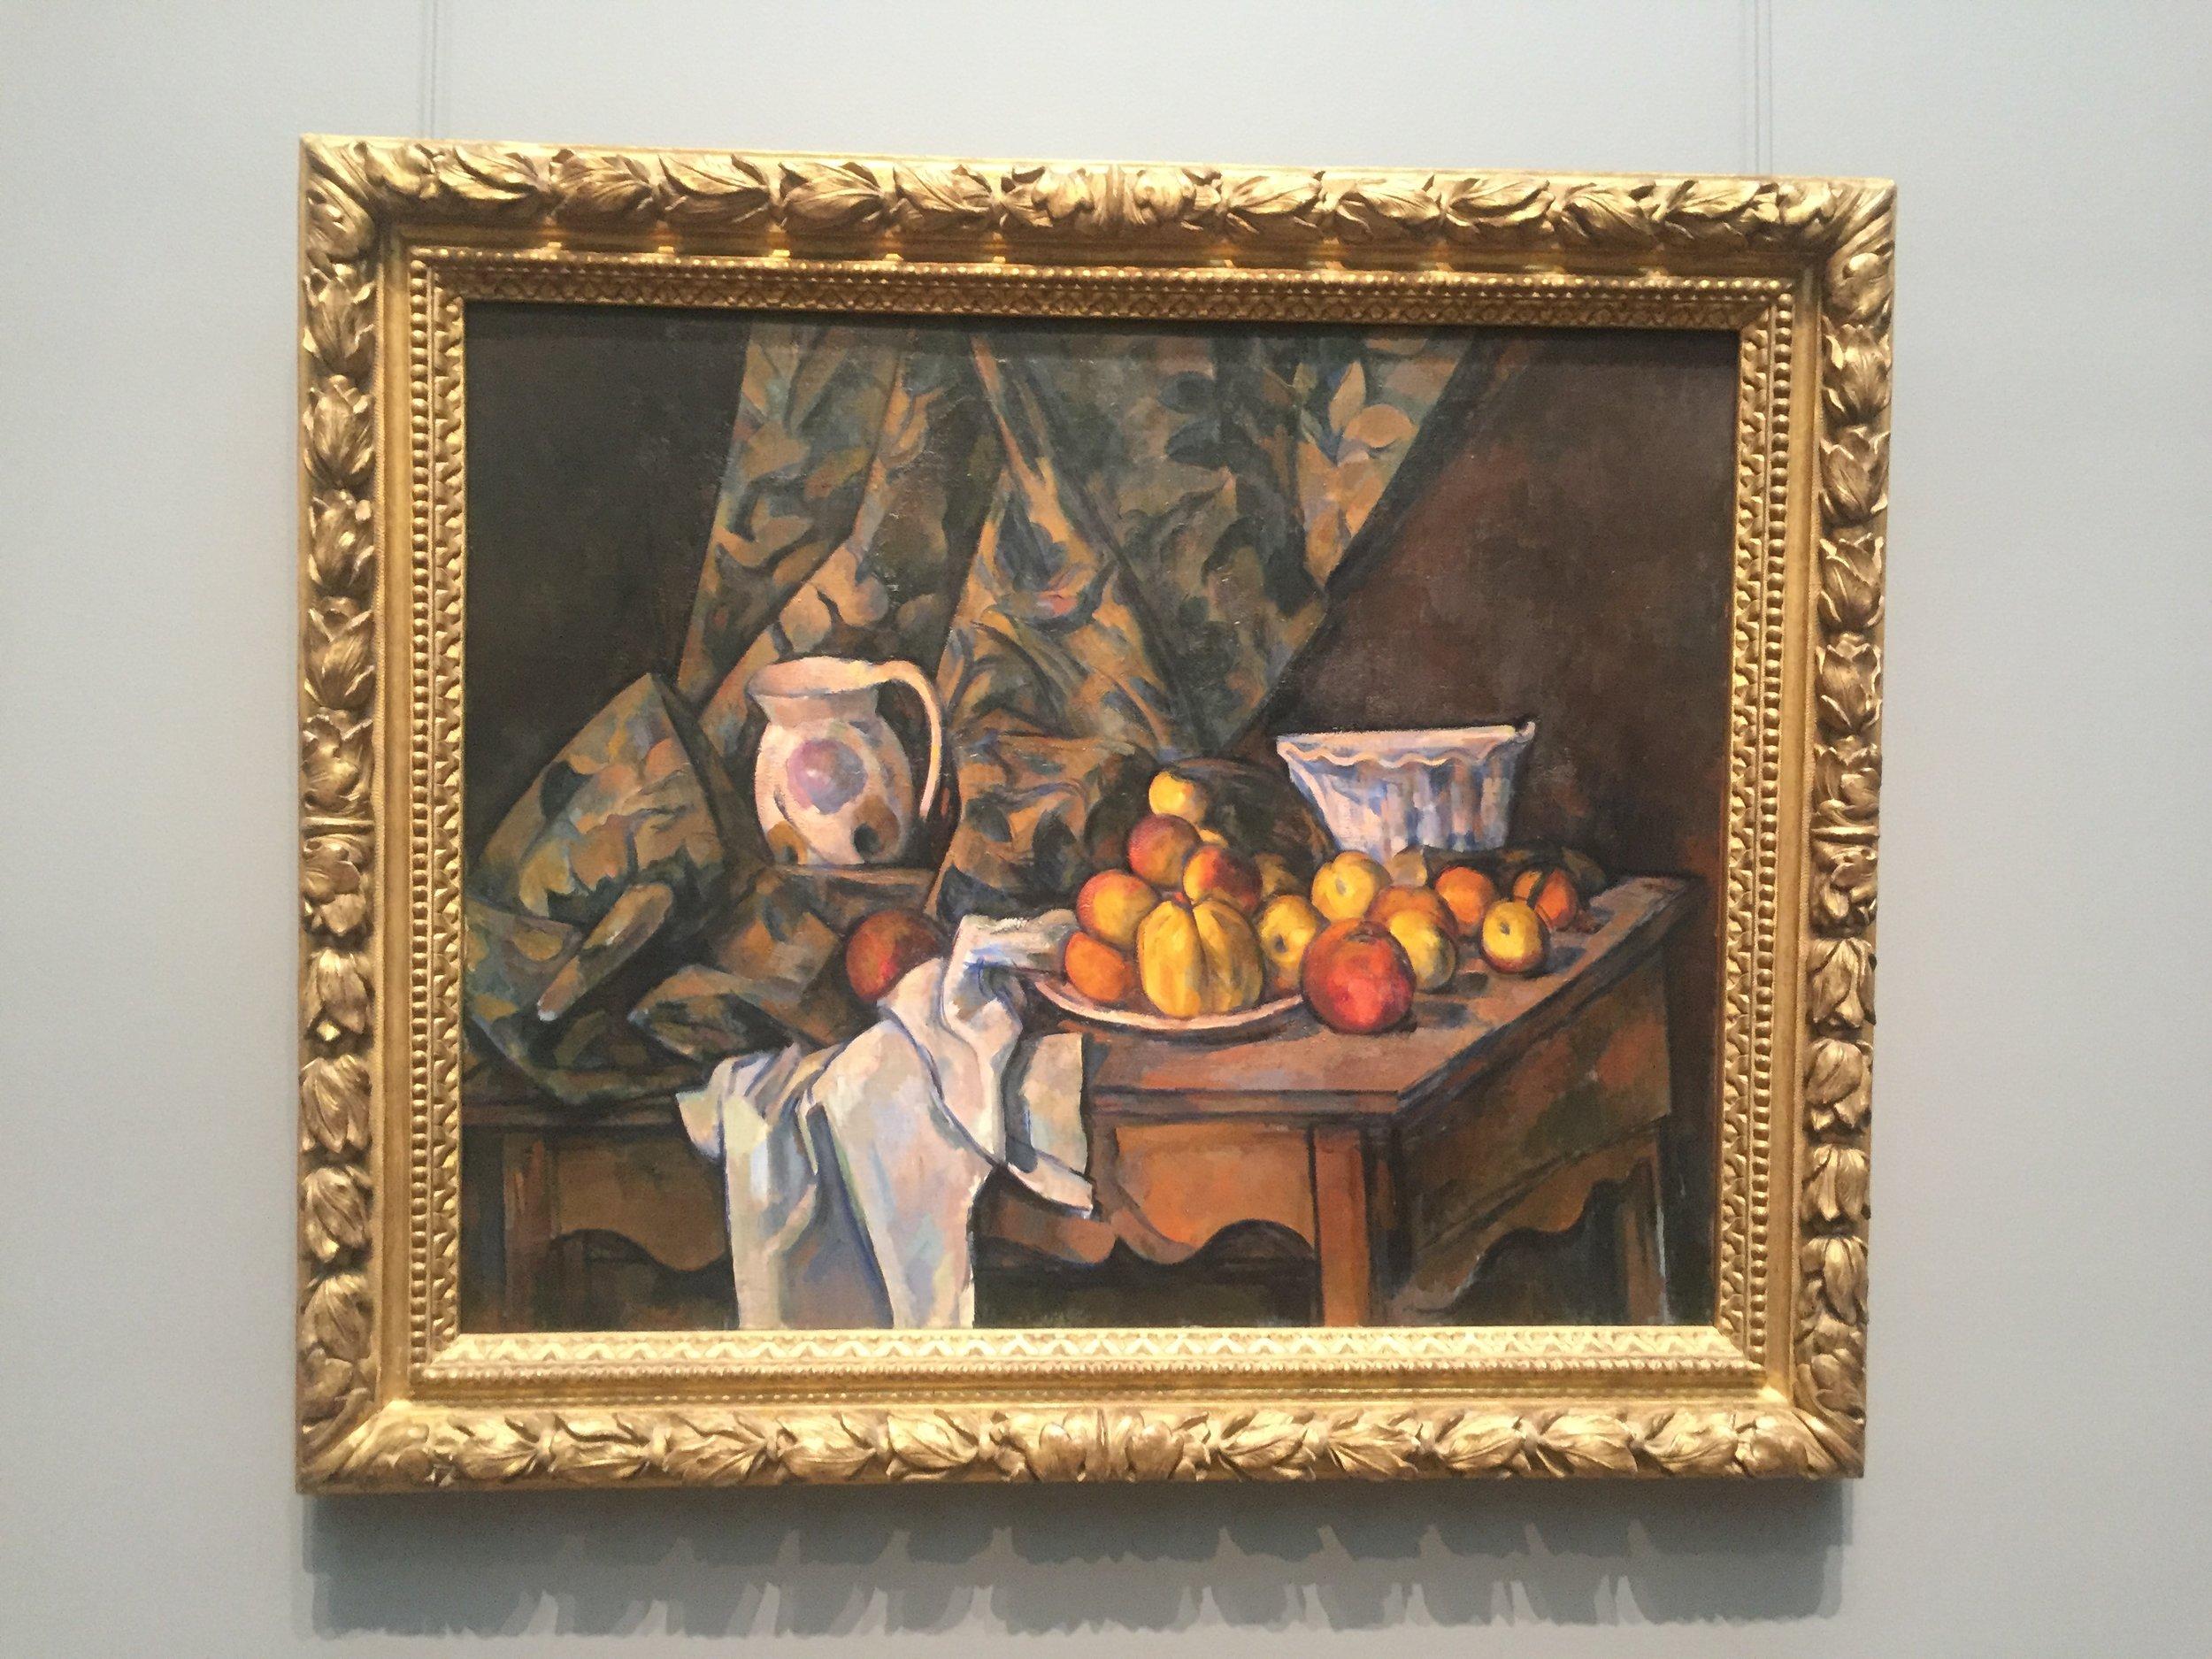 cezanne peaches still life national gallery.JPG